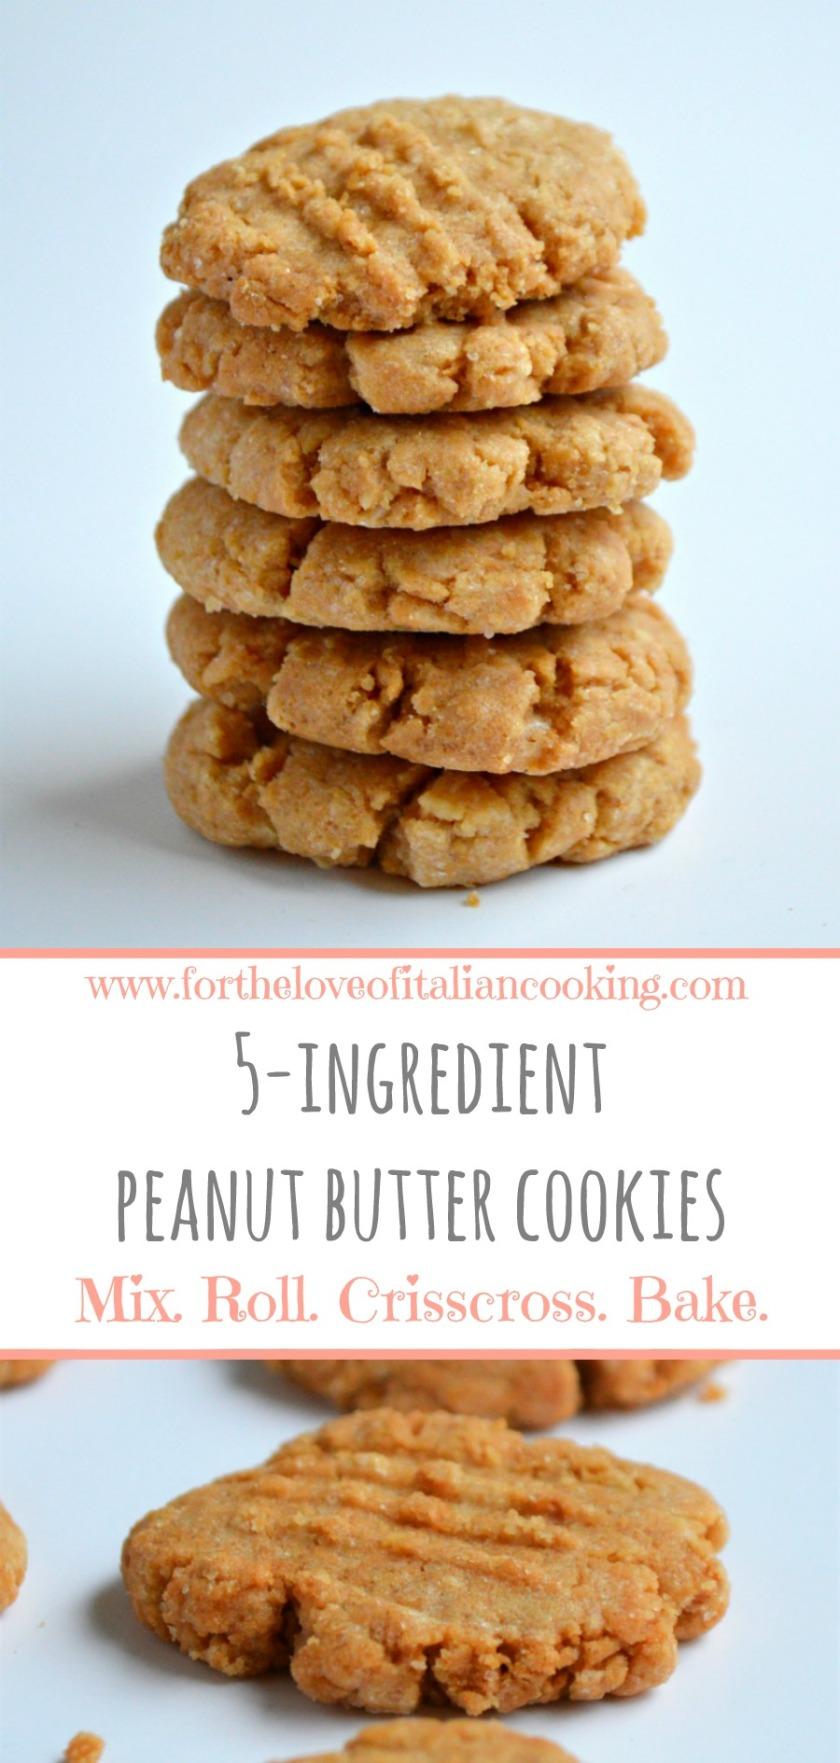 pinterest-peanut-butter-cookies-900px-no-border-pink